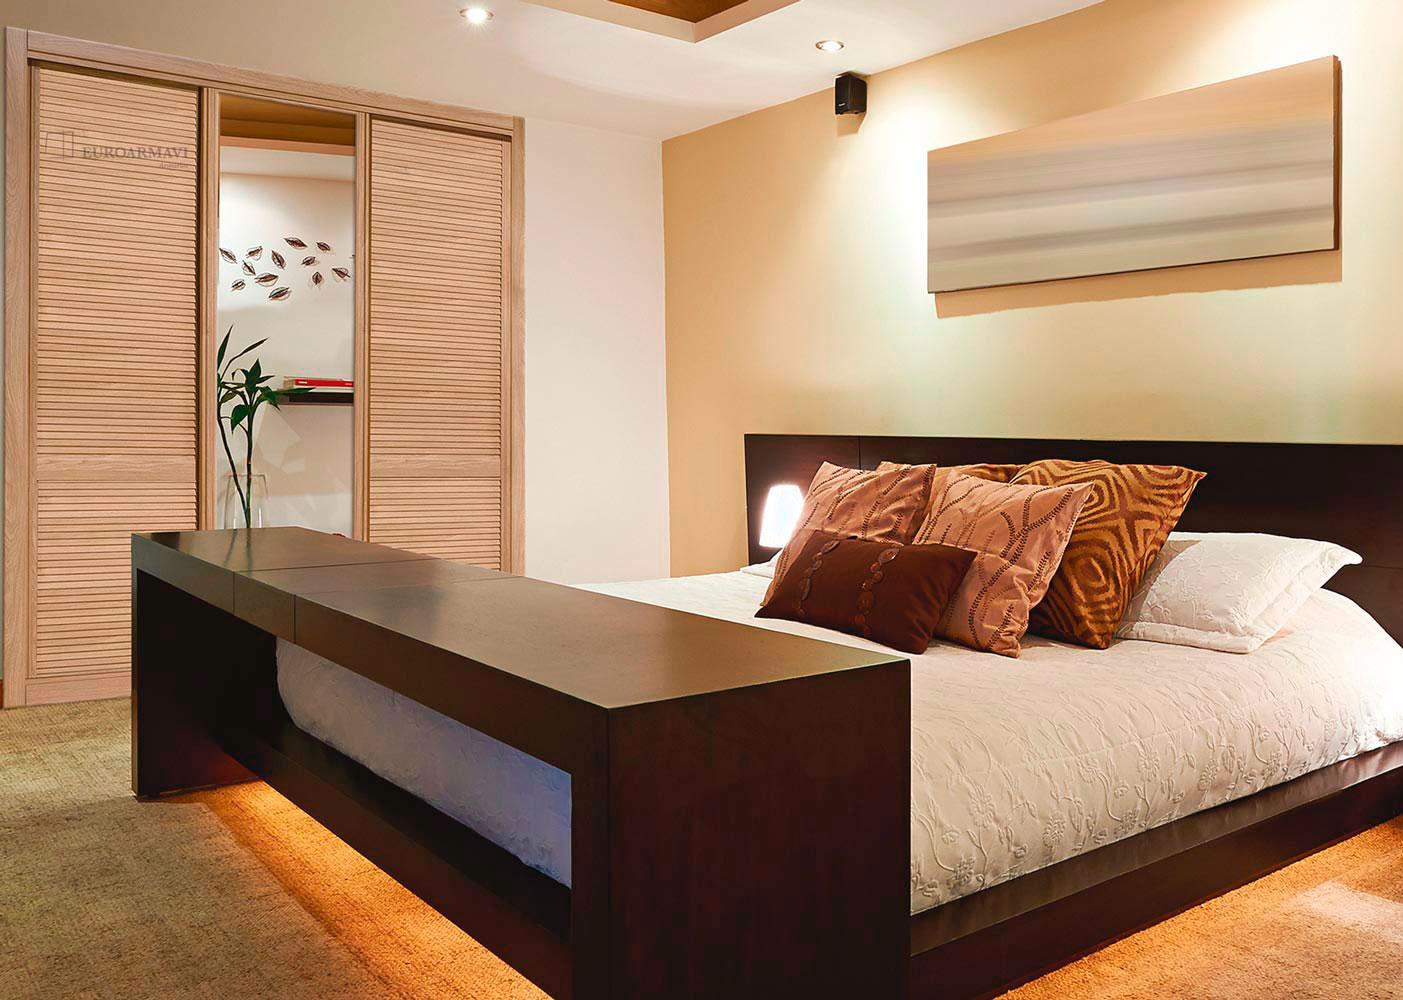 Mallorquina roble espejo puertas innova s l u - Armarios para dormitorios ...